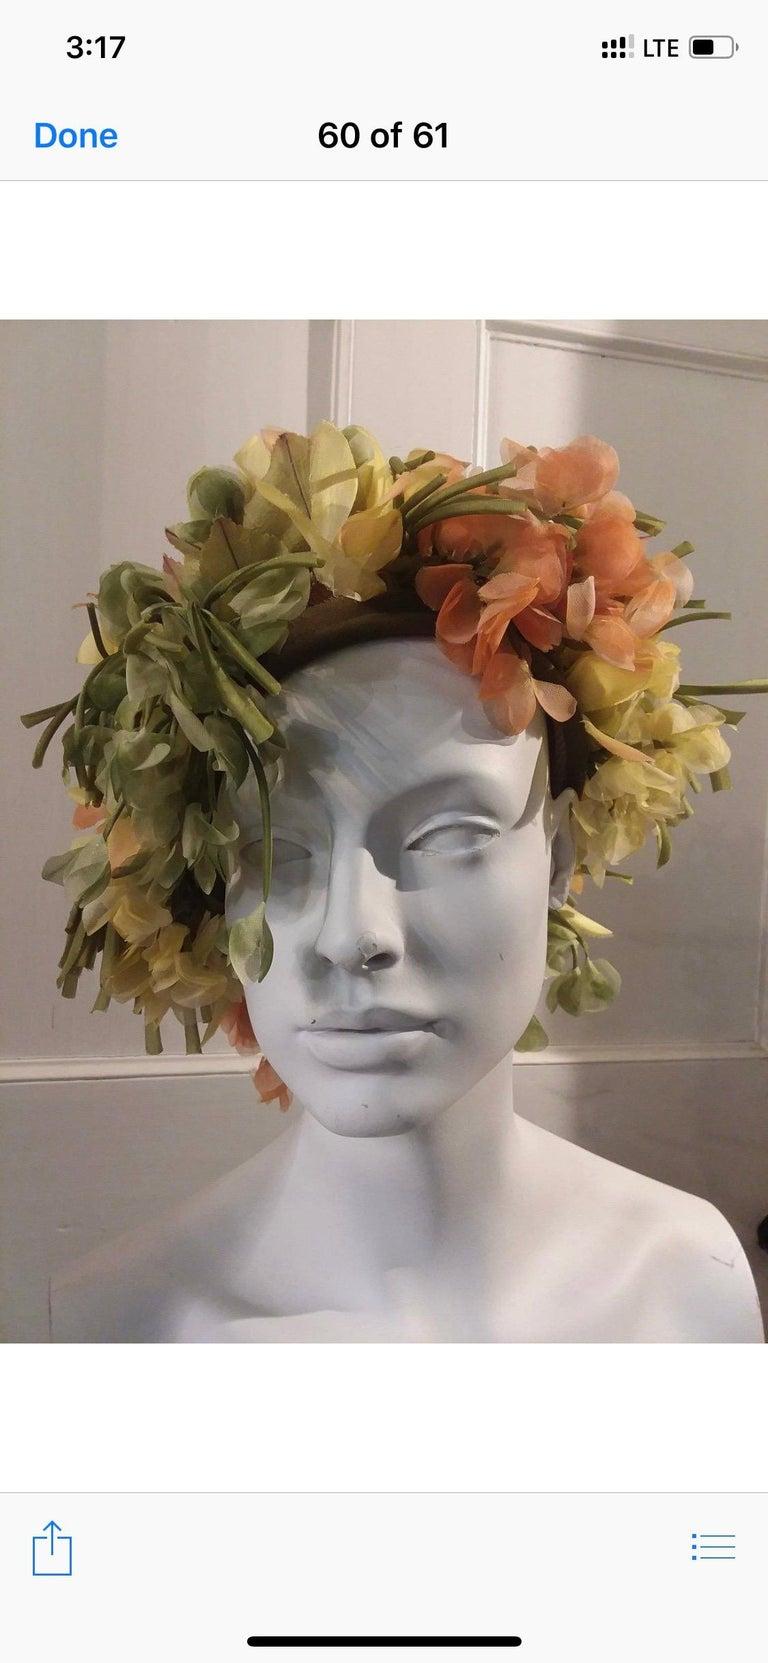 1960s Christian Dior Autumnal Hat W/ Silk Florals & Leaves Over Netting. Olive velvet edging. Originally sold at John Wanamakers, Philadelphia. Size - Medium.